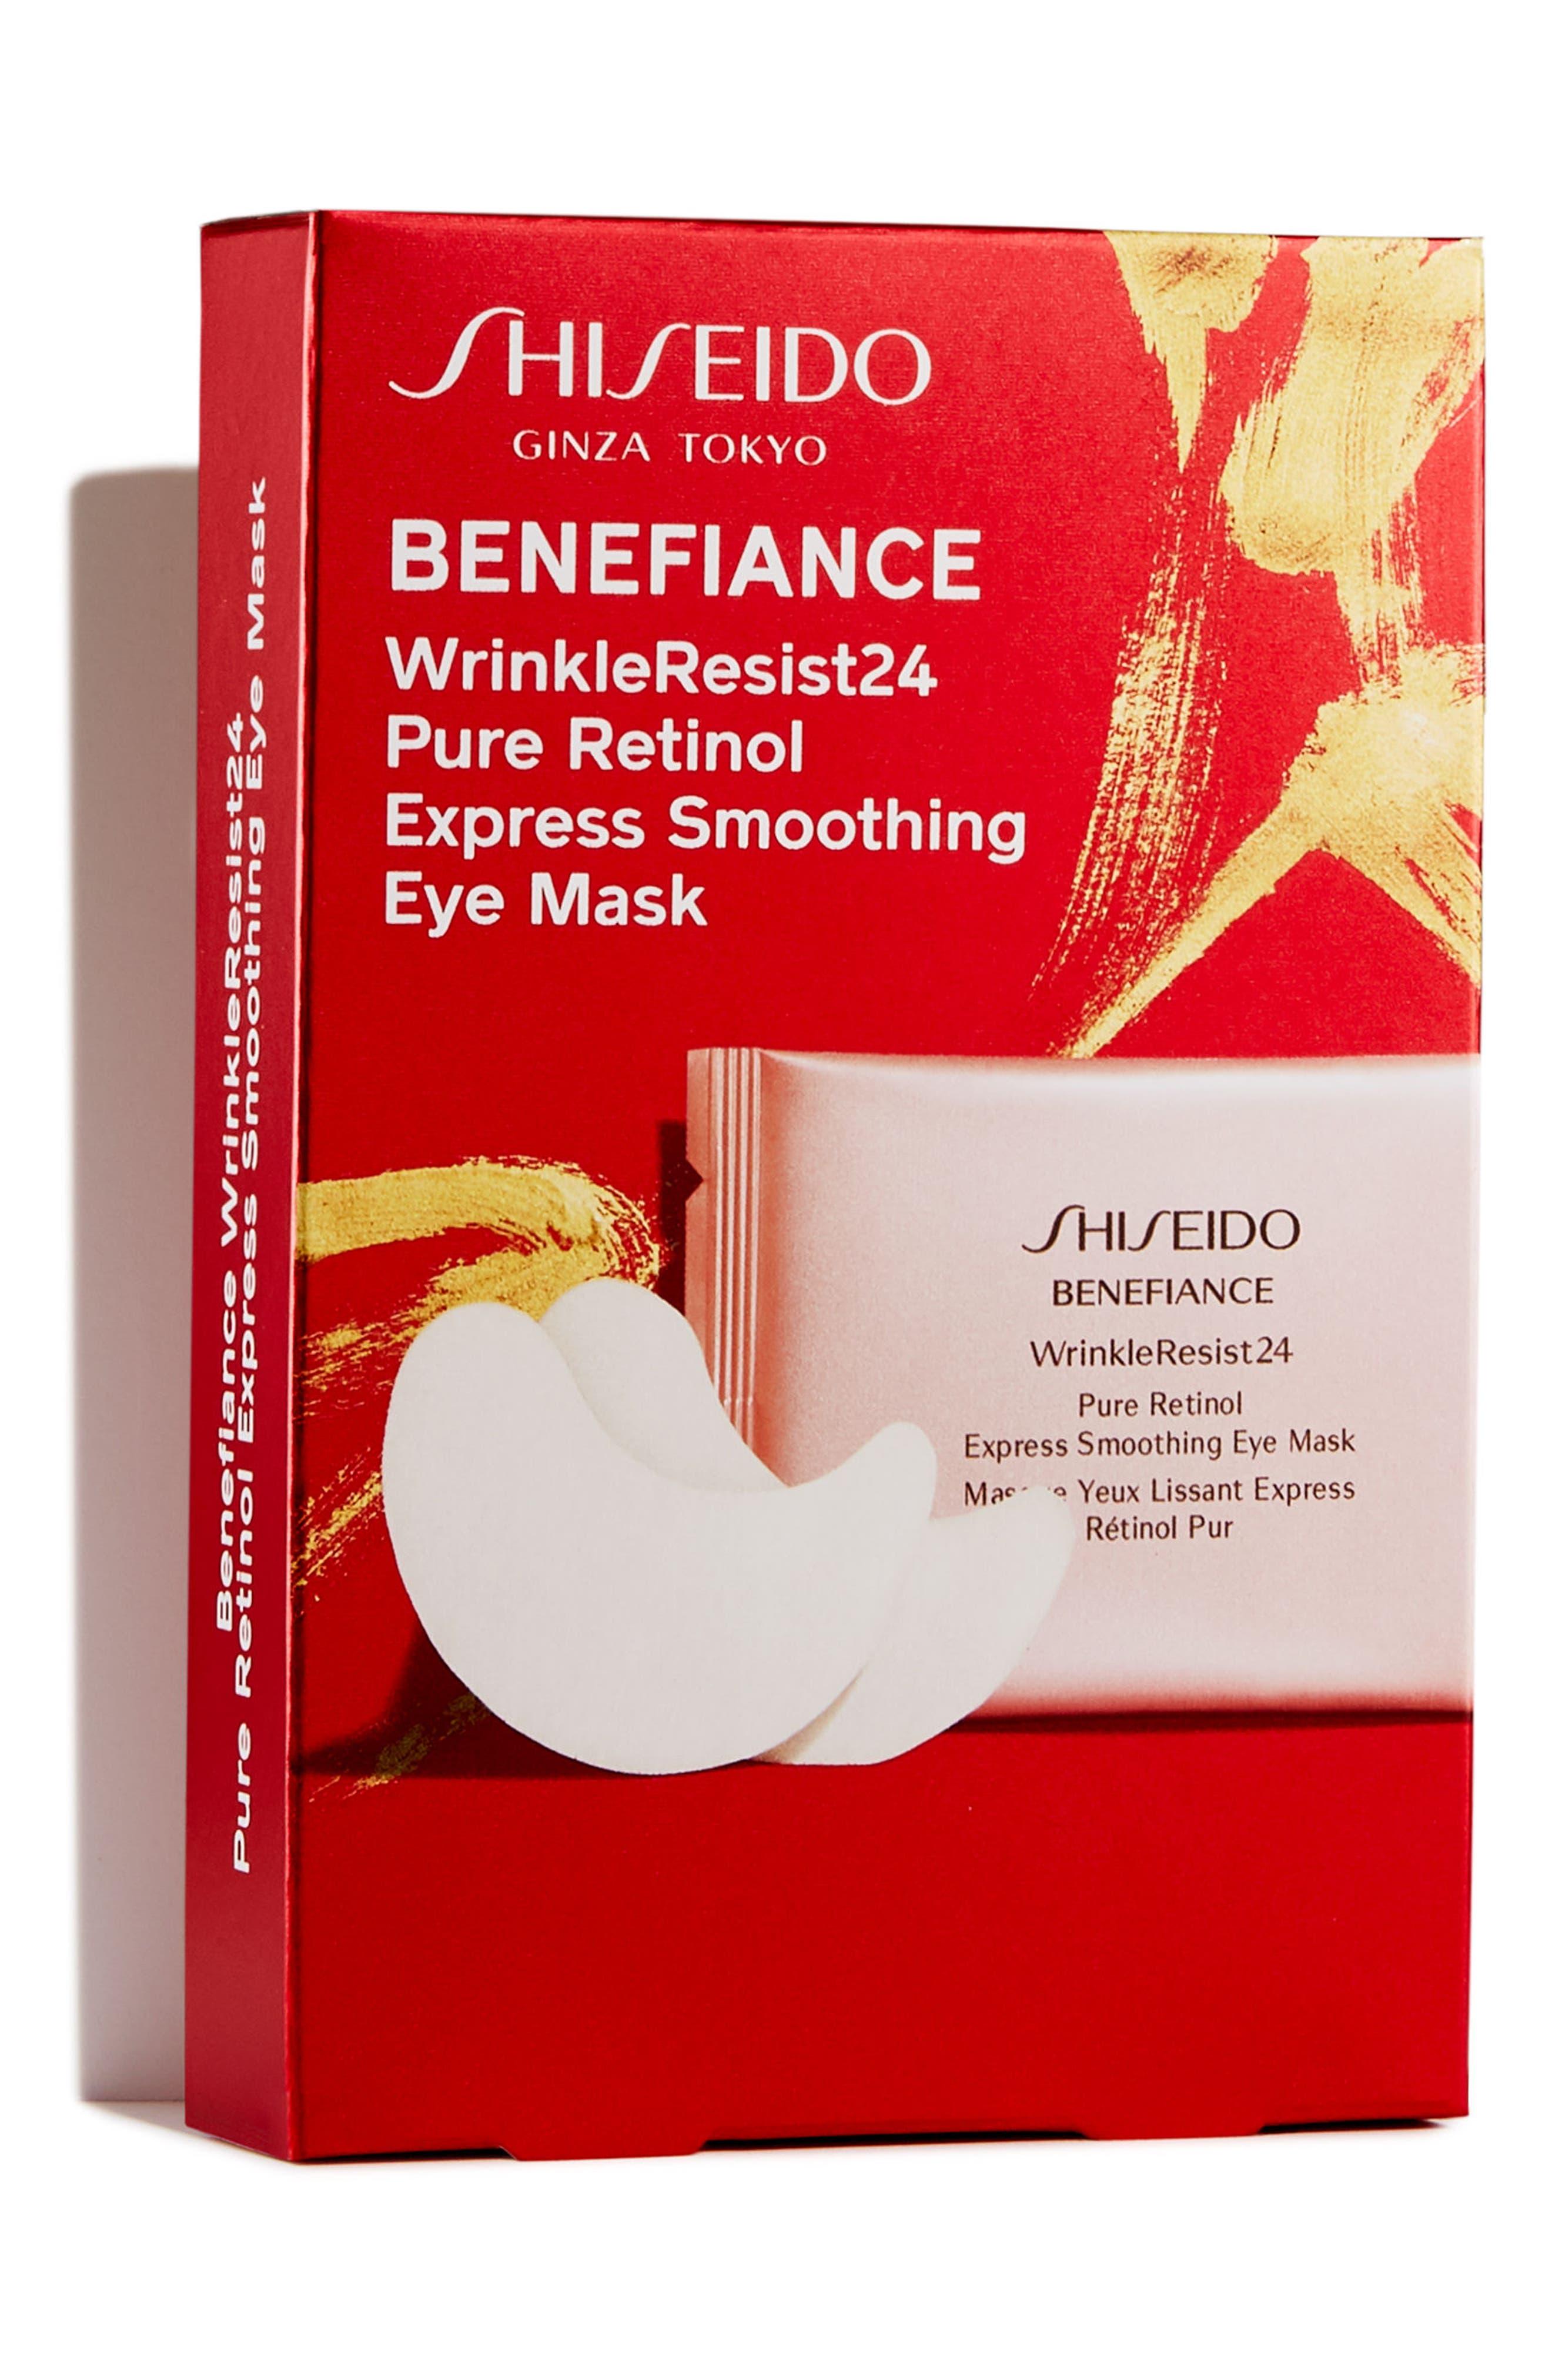 Benefiance WrinkleResist24 Pure Retinol Express Smoothing 3-Pack Eye Masks,                             Alternate thumbnail 3, color,                             No Color